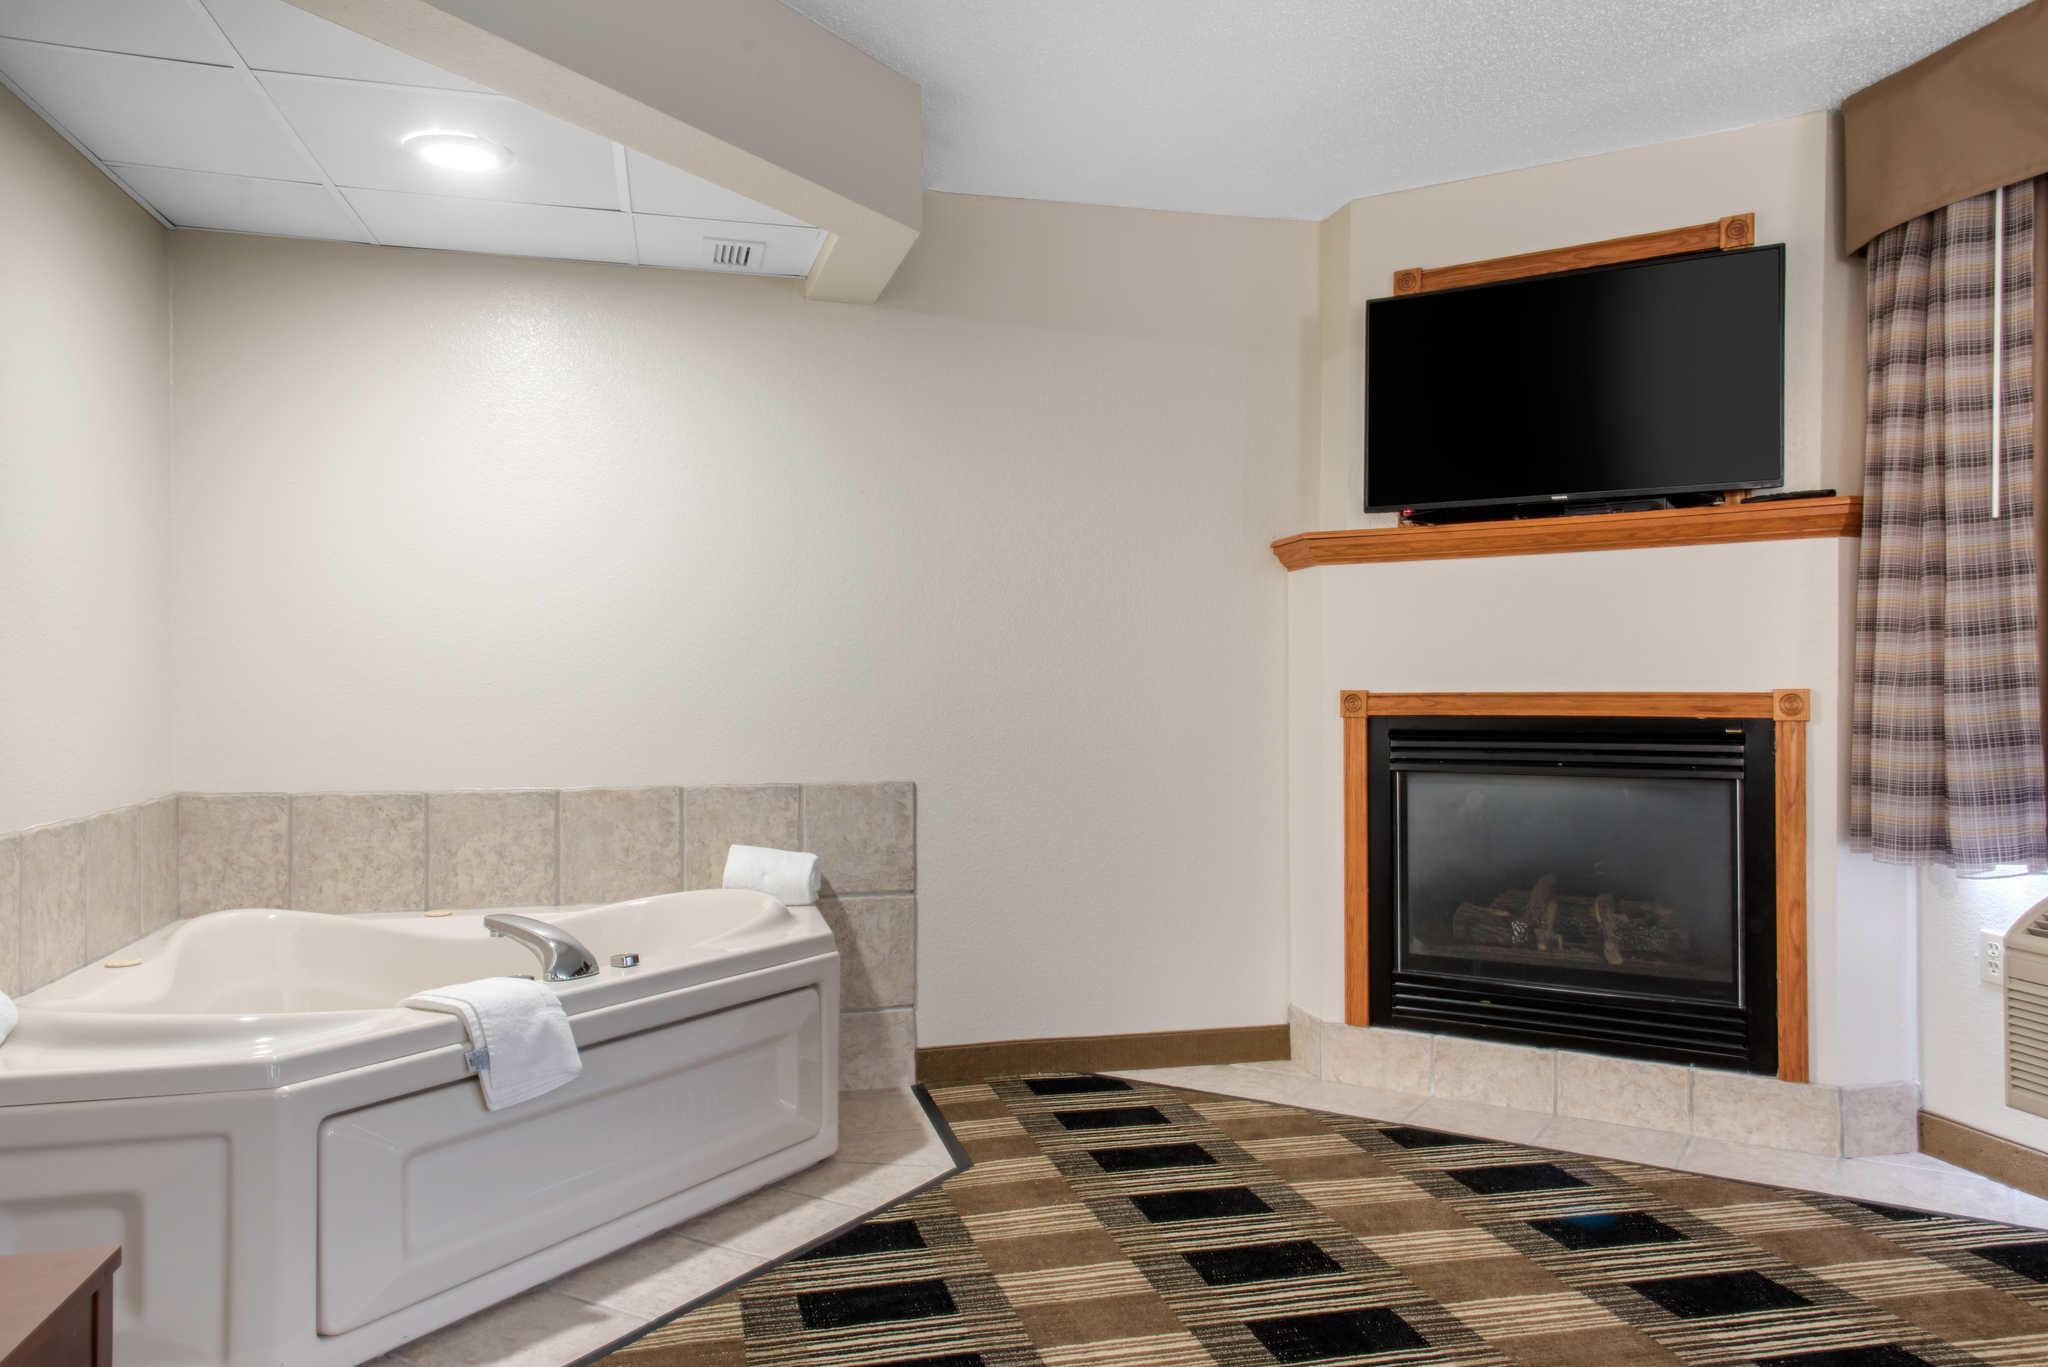 Quality Inn image 36